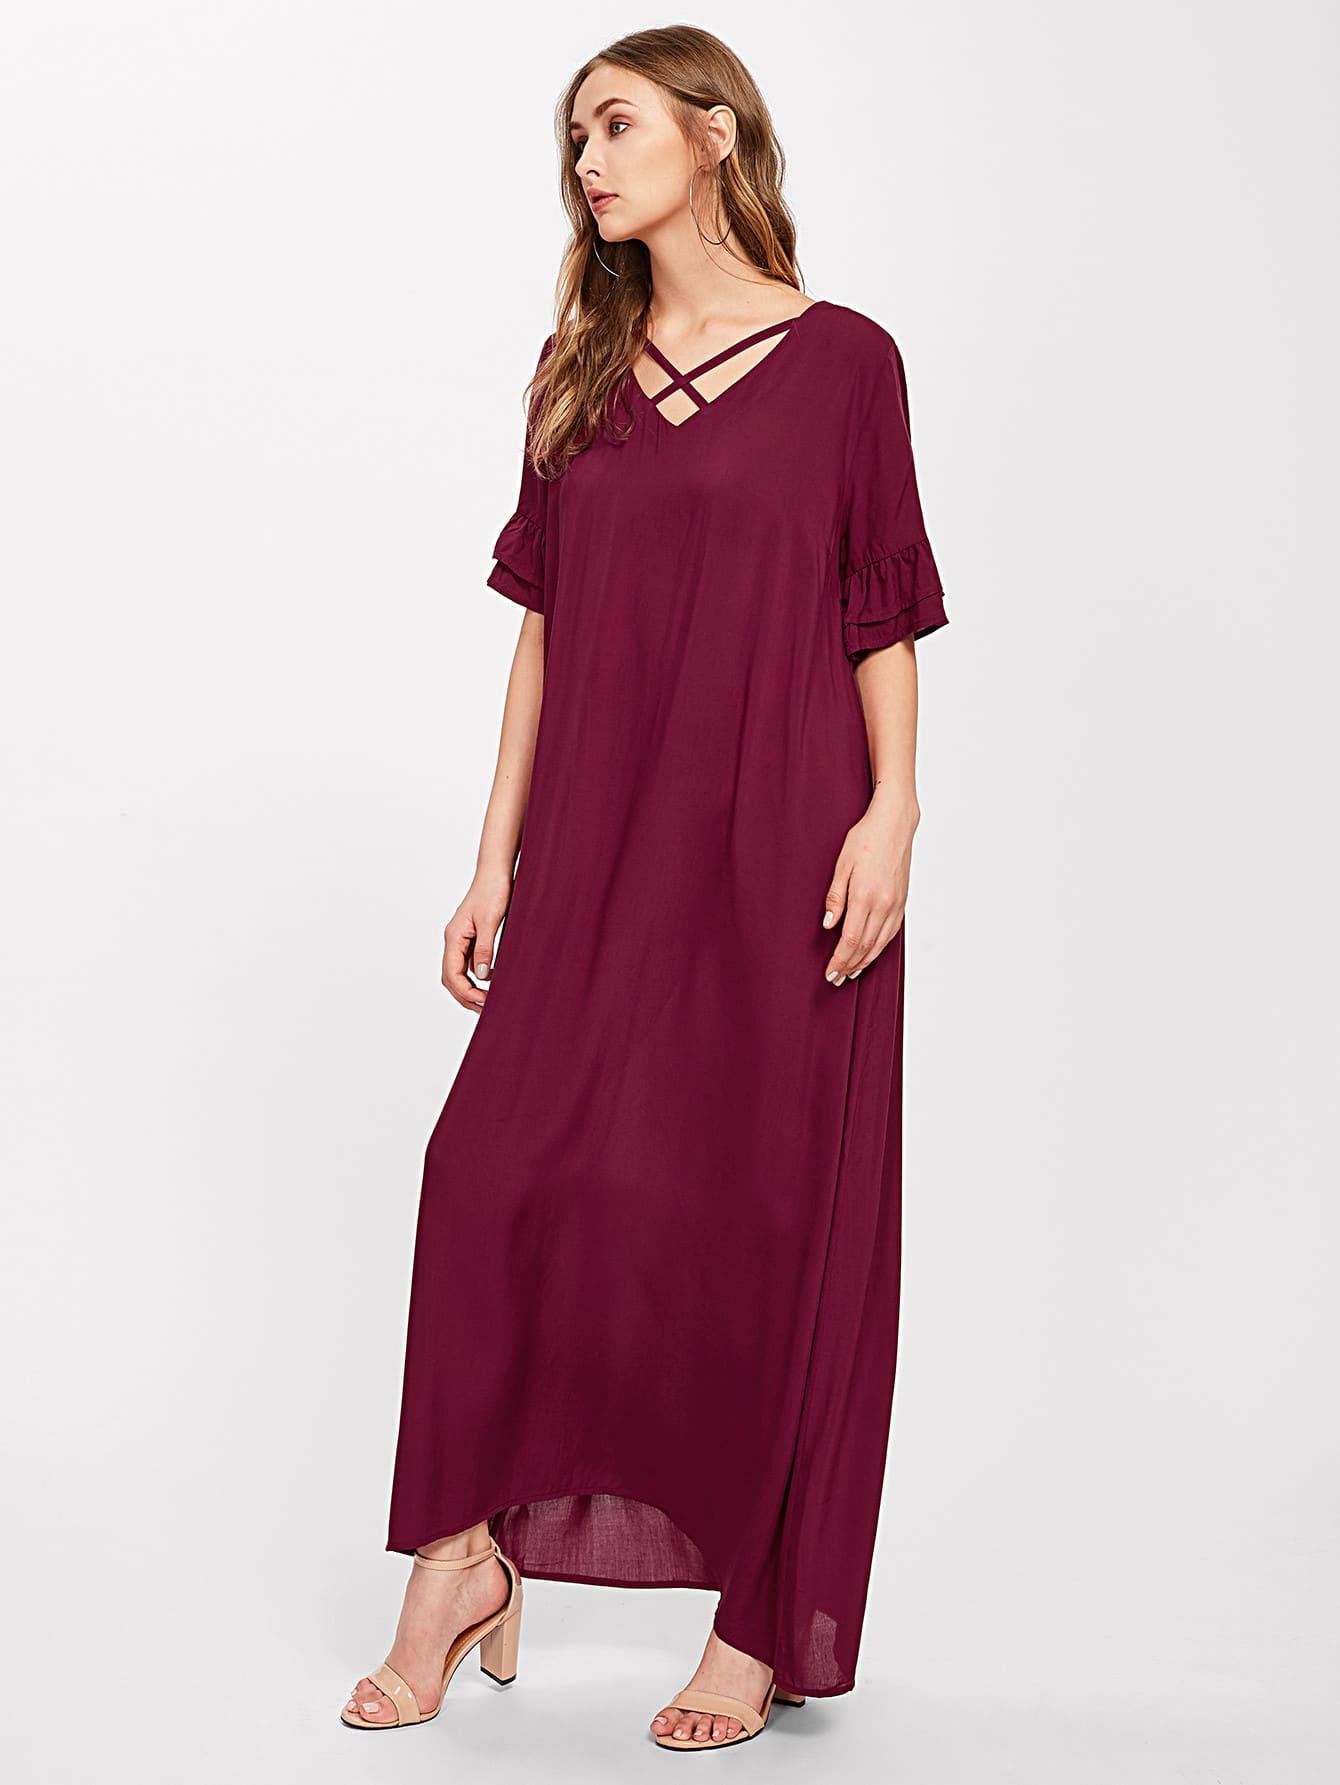 Фото Tiered Flared Sleeve Criss Cross Maxi Dress. Купить с доставкой